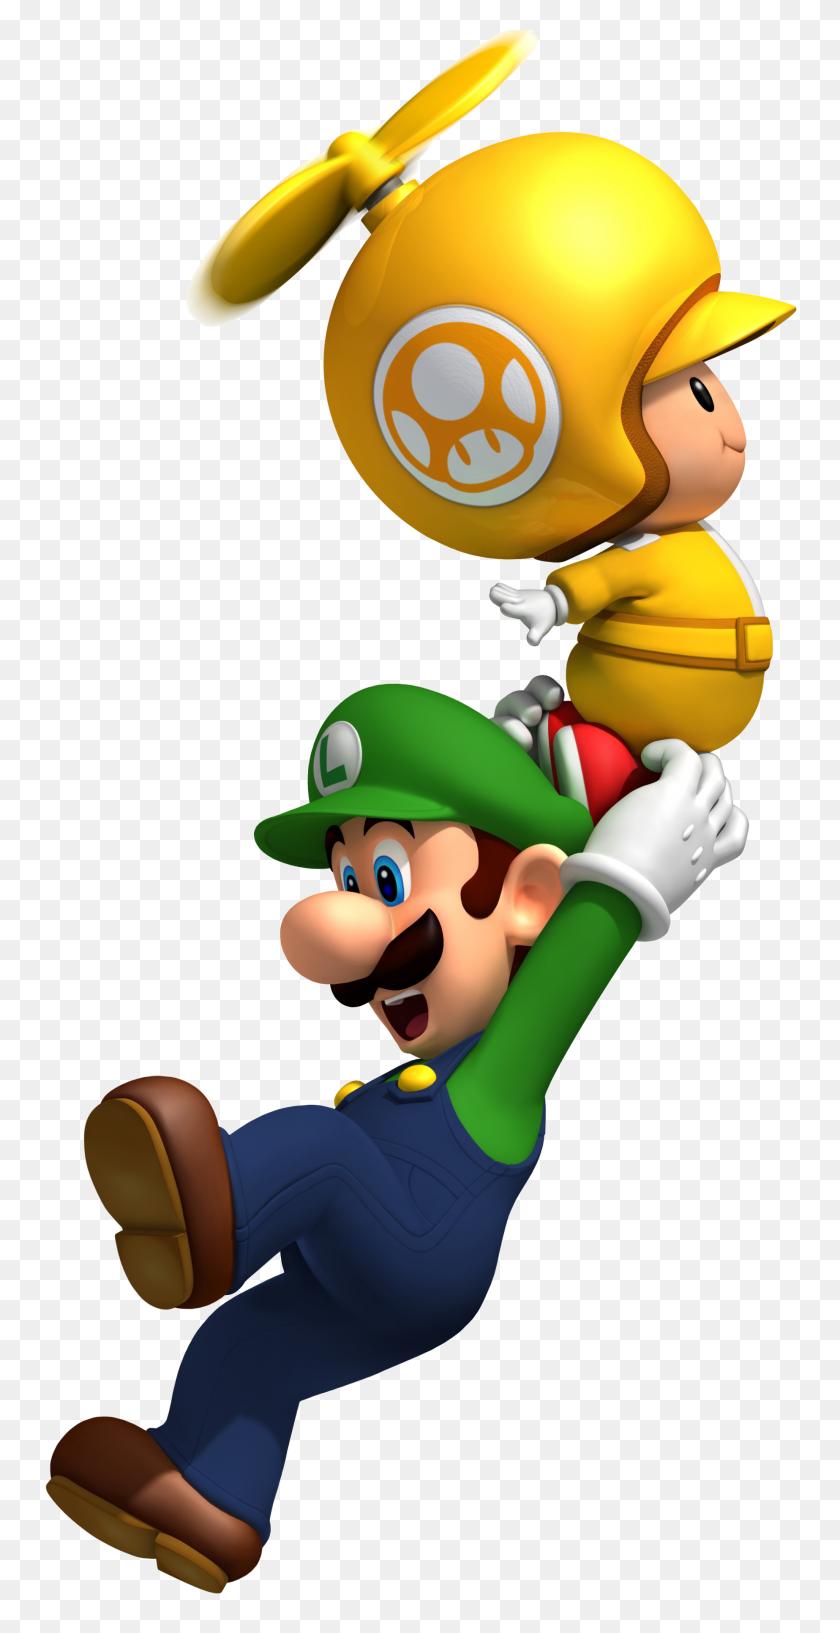 New Super Mario Bros Mario Bros Super Mario Bros - Super Mario Bros PNG